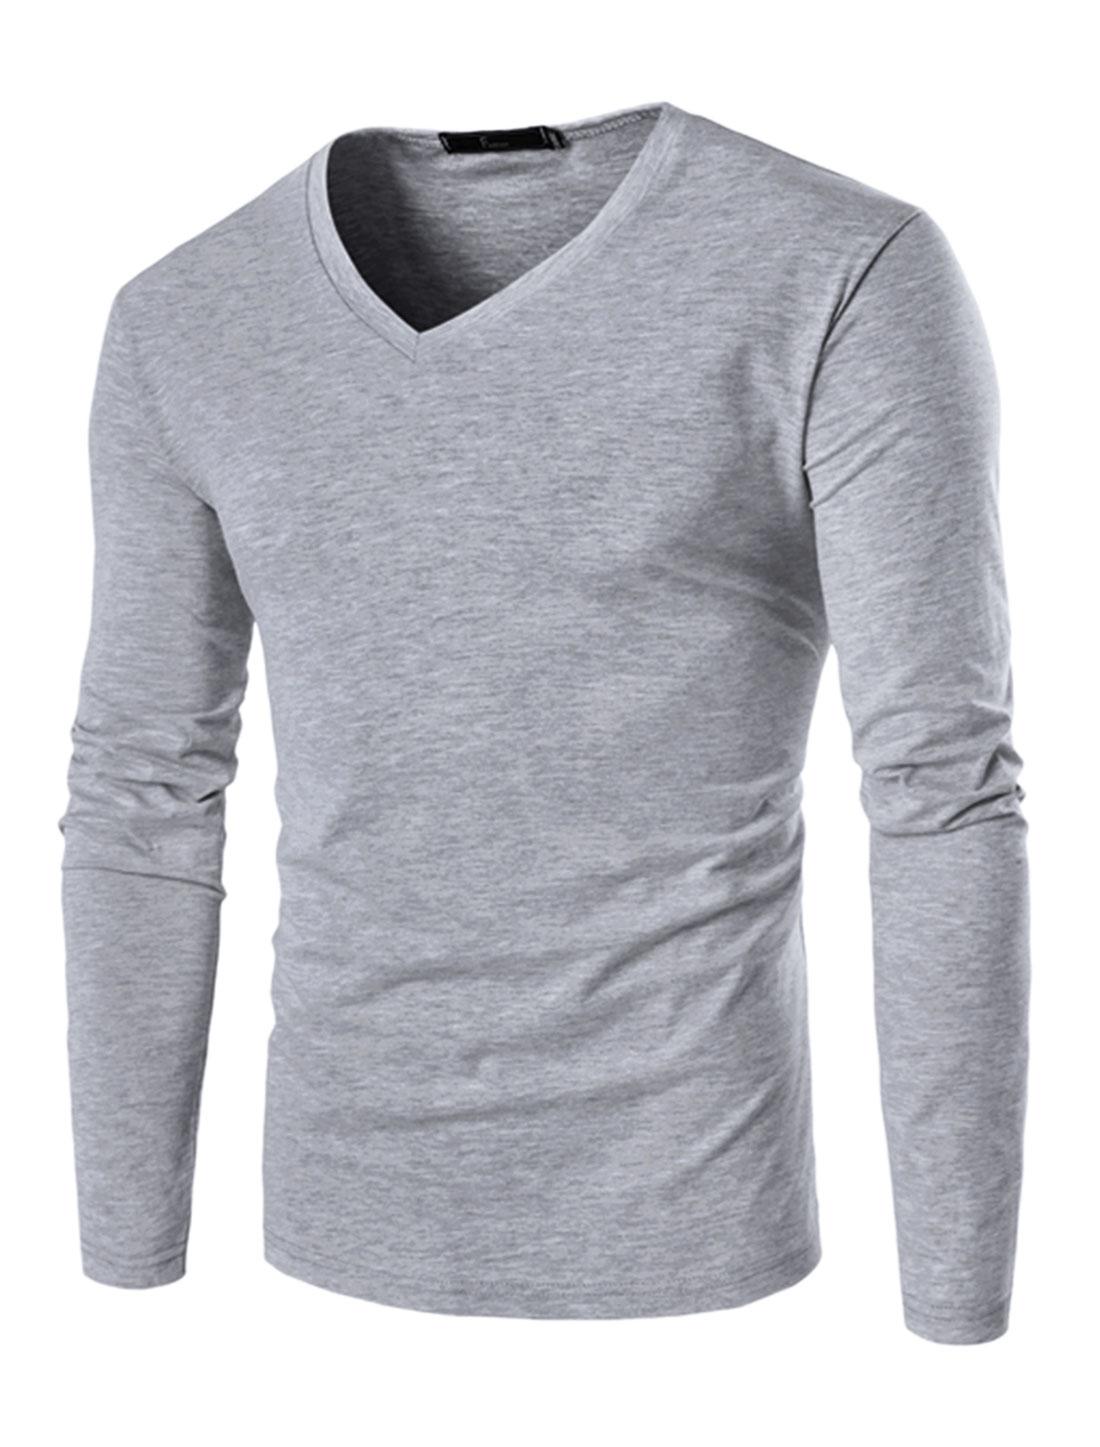 Men V Neck Long Sleeves Slim Fit Tee Shirt Gray M